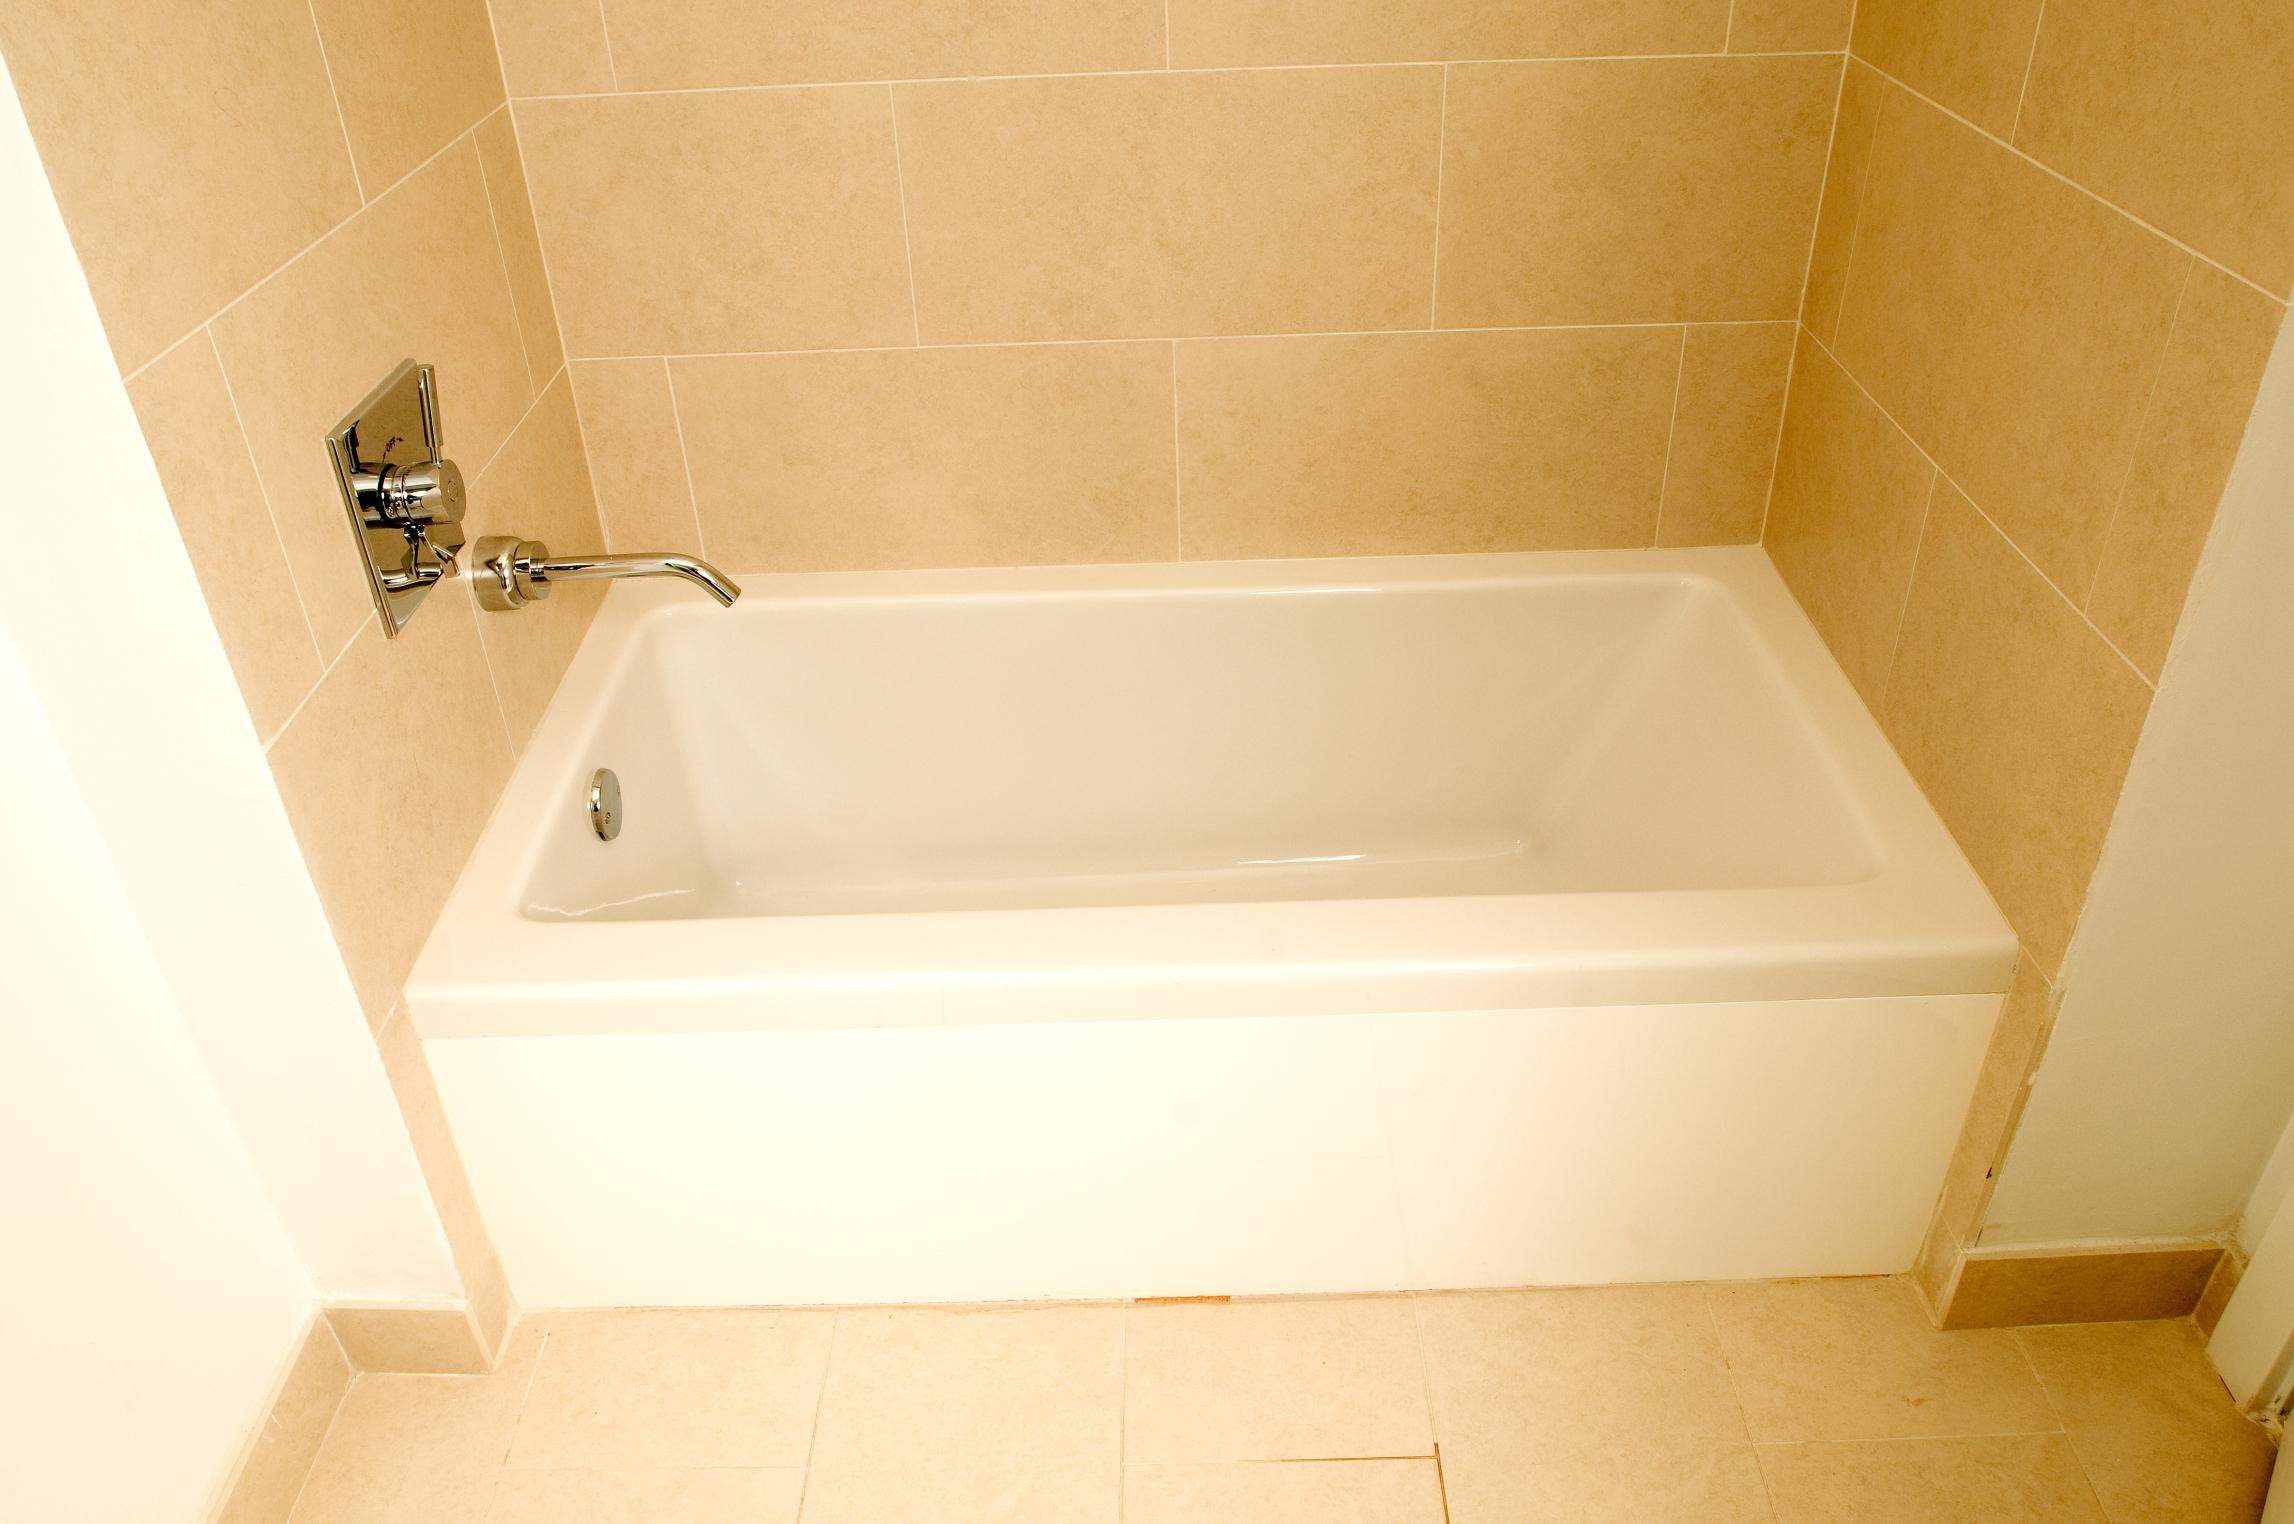 https homeguides sfgate com replace faucet handles spout old tub 26199 html